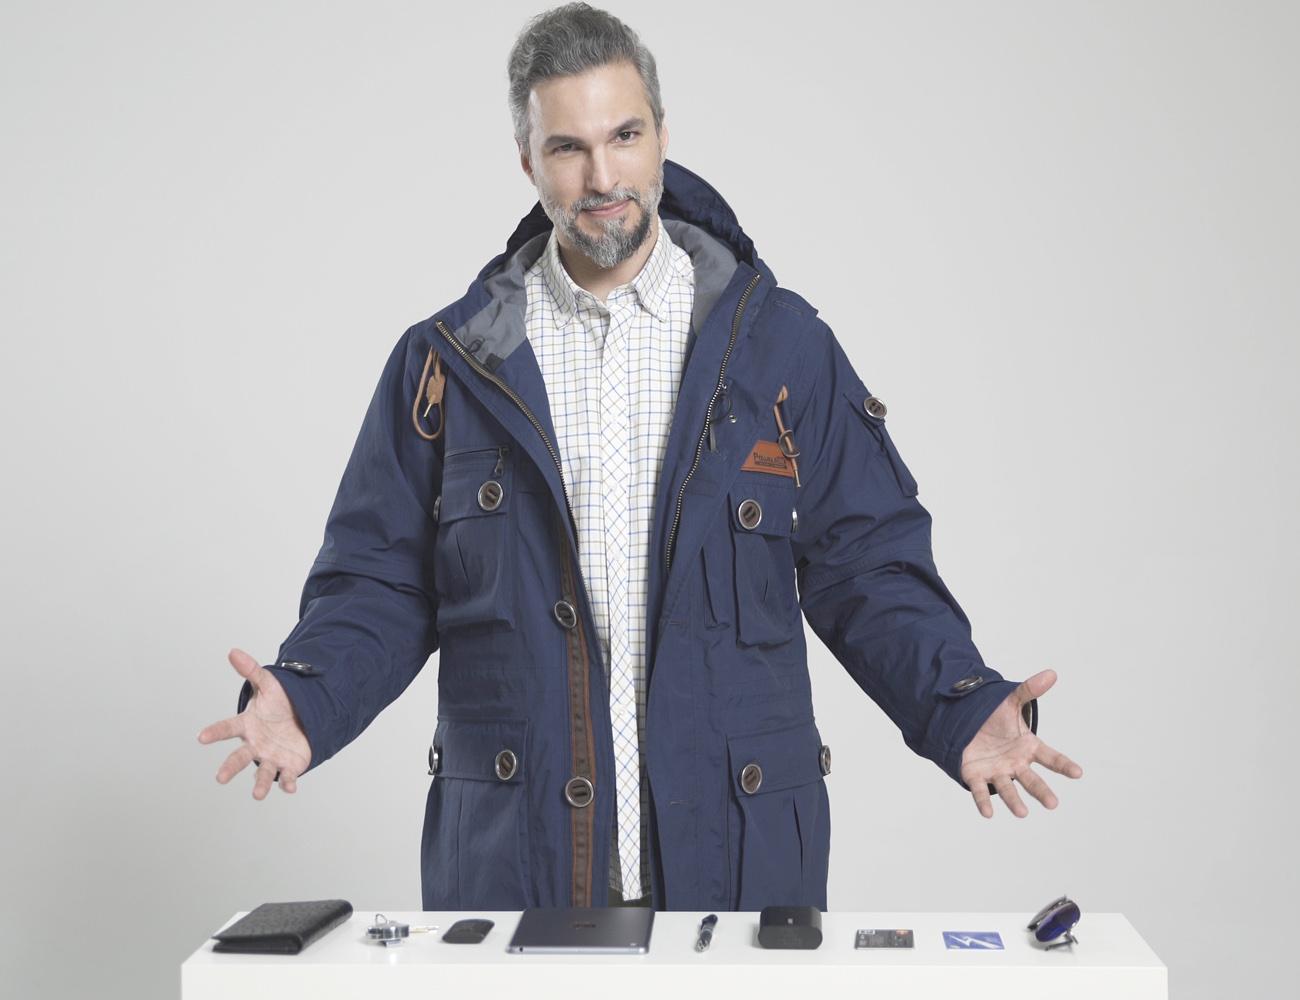 PowearIN2.0 – World First Modular Multi-purpose Travel Jacket